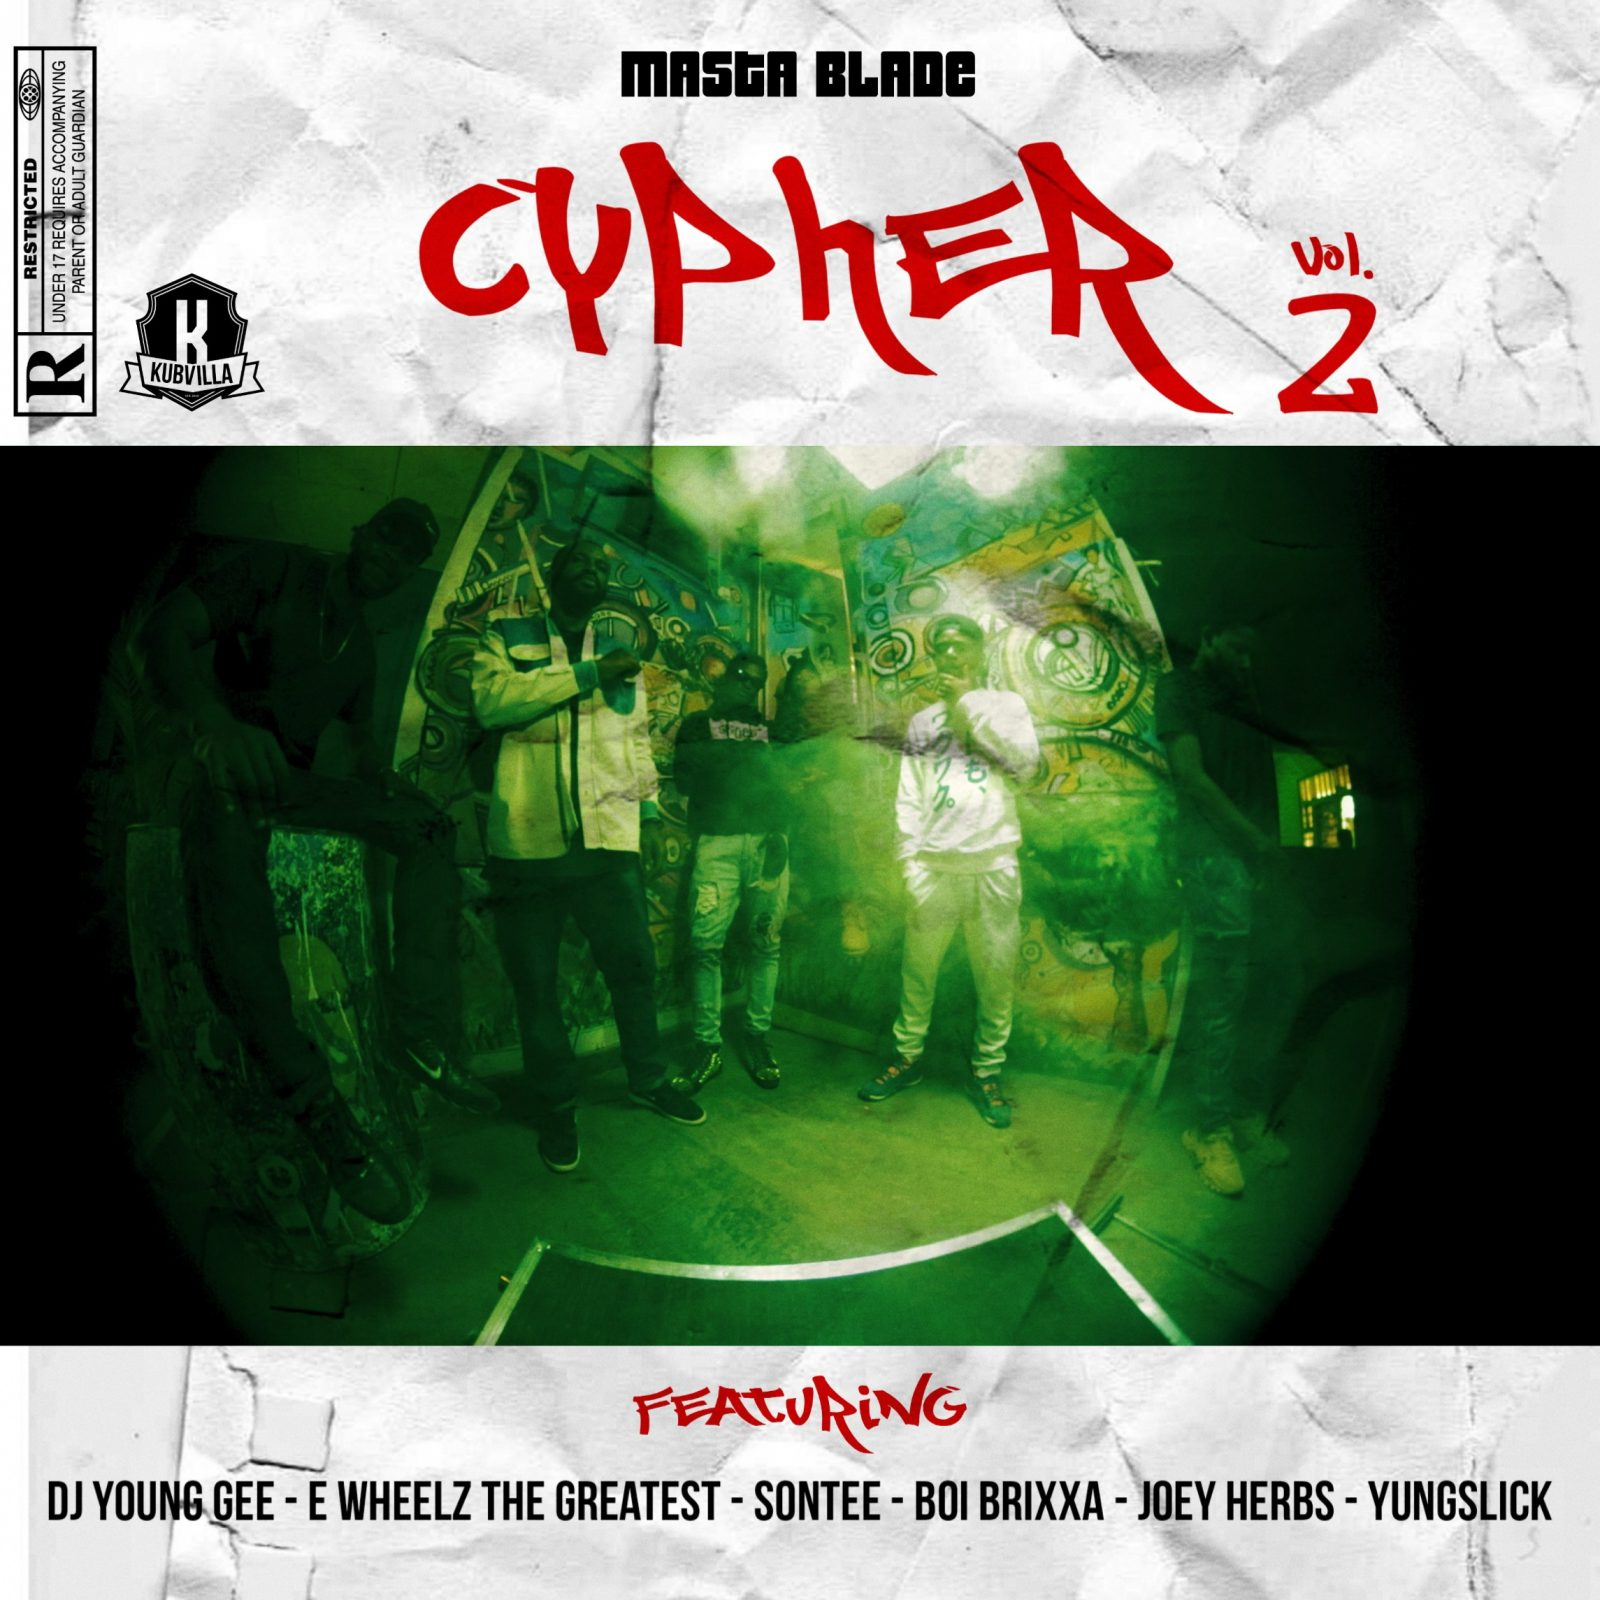 Masta Blade Cypher 2.0 Featuring – Dj young Gee -Ewheelz the greatest – Sontee – Brixxa – Joey – Herbz – Yungslick